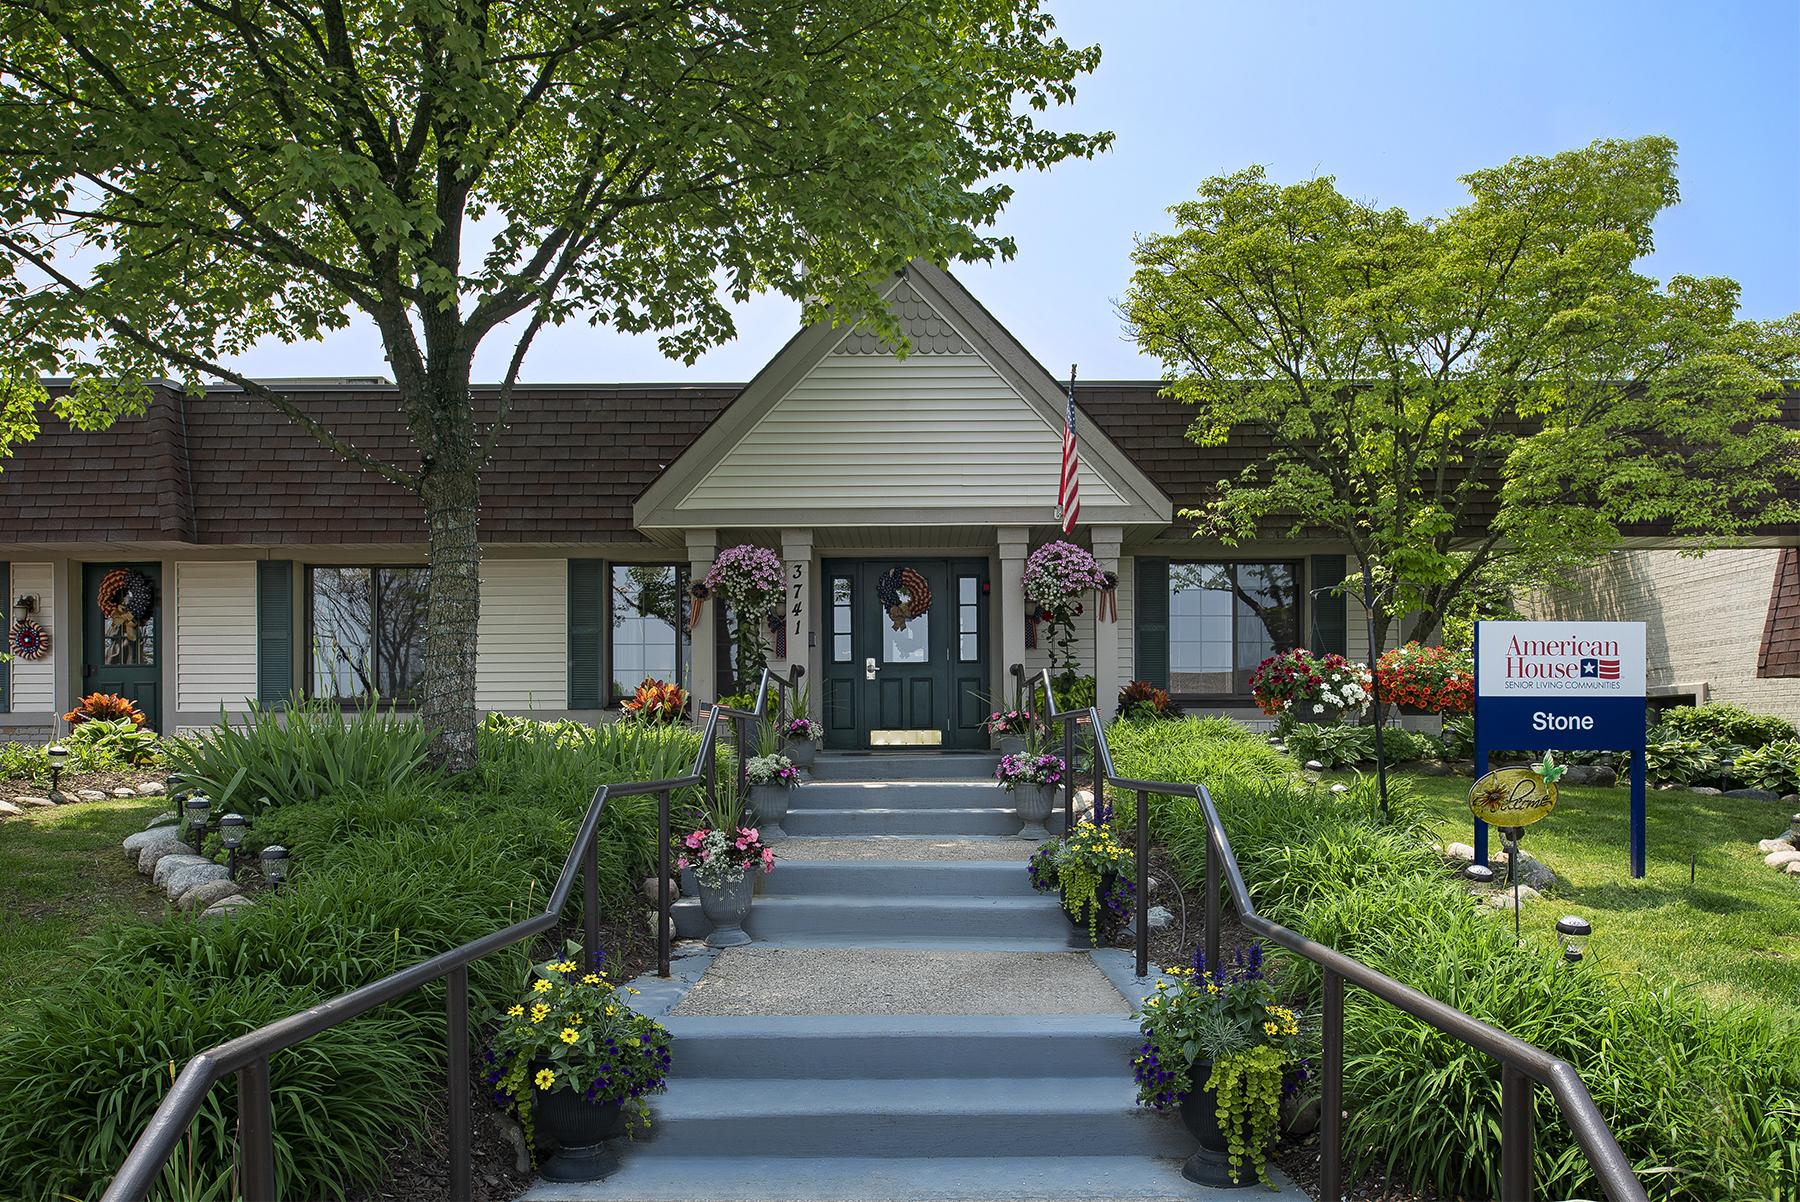 American-House-Stone-Mi-Rochester-Hills